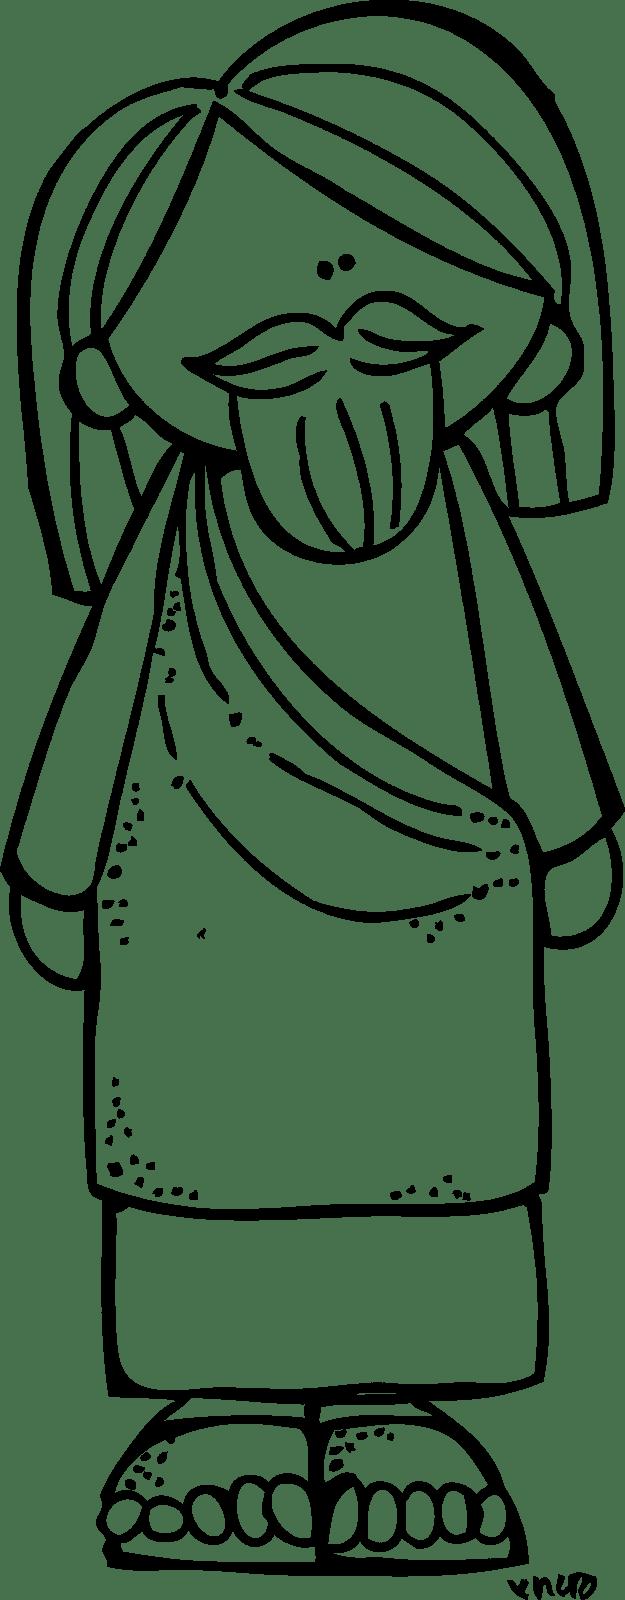 Melonheadz clipart religious, Melonheadz religious